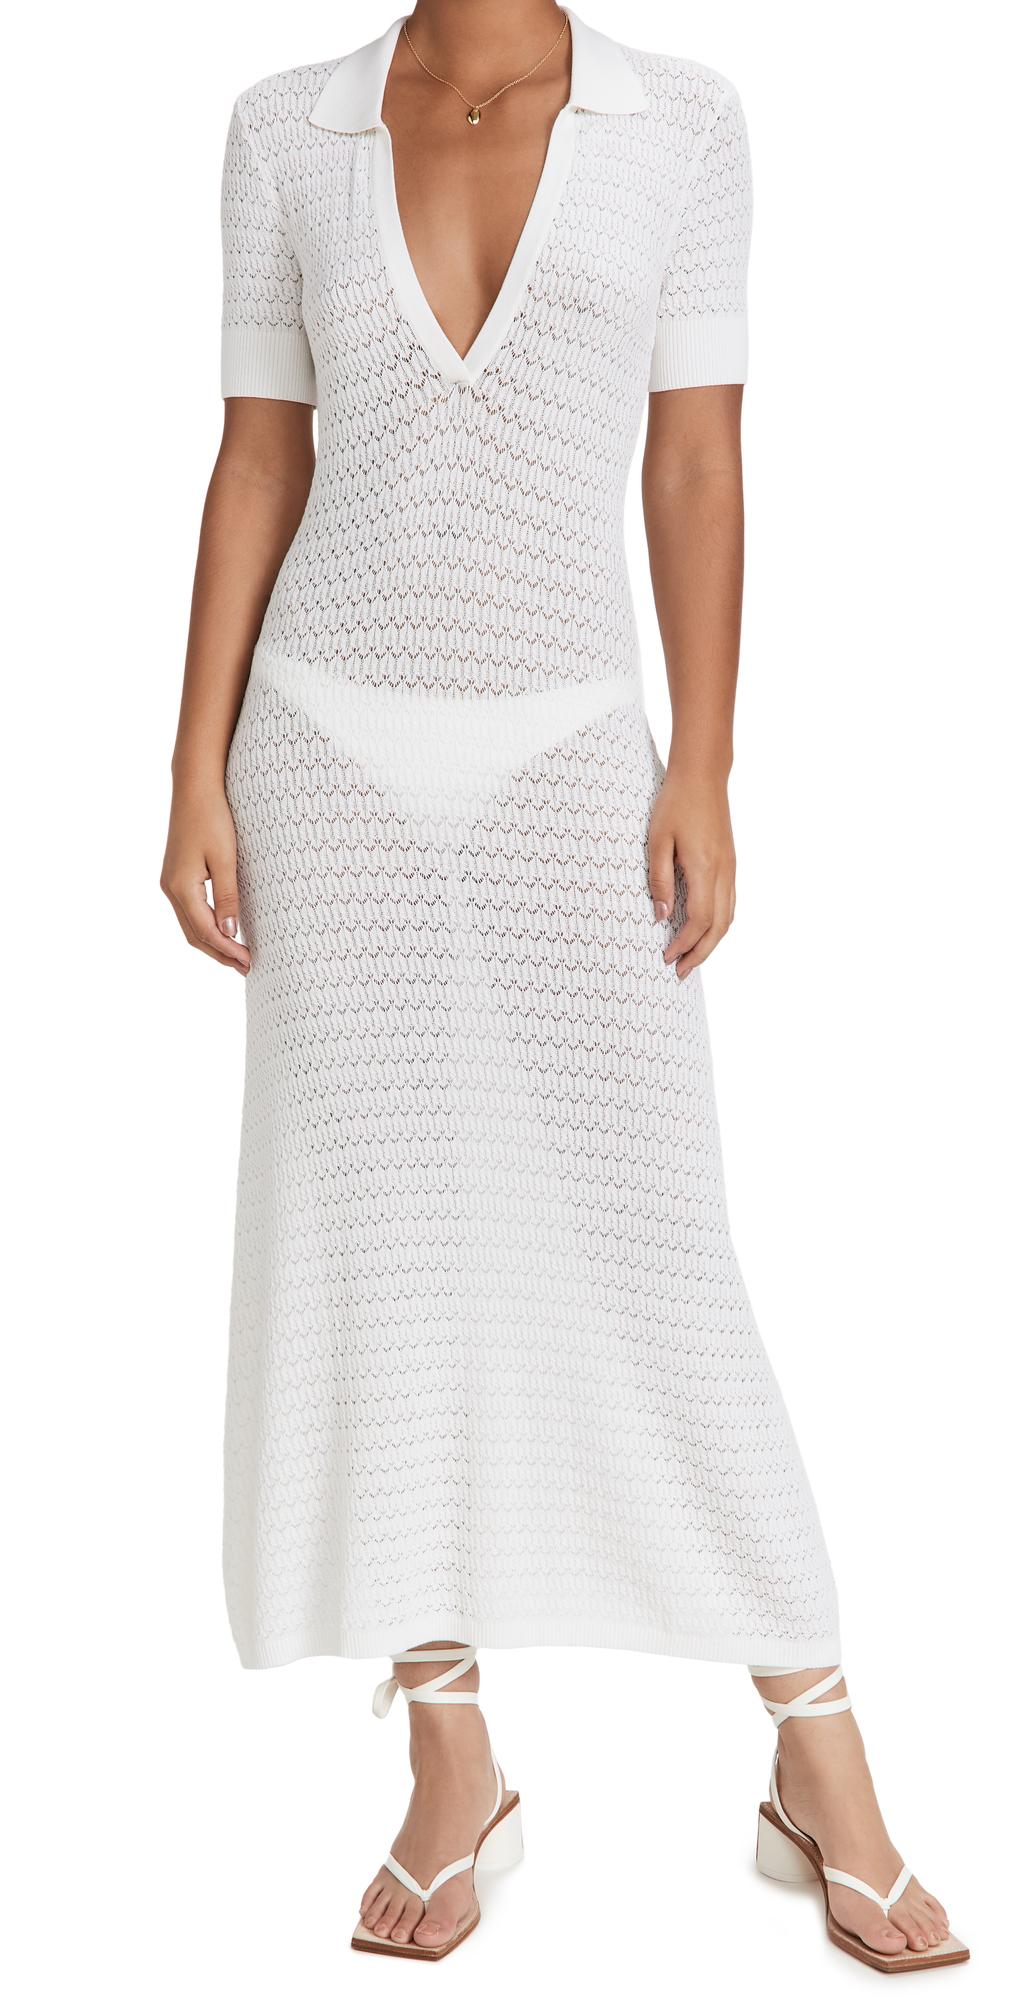 Nola Dress